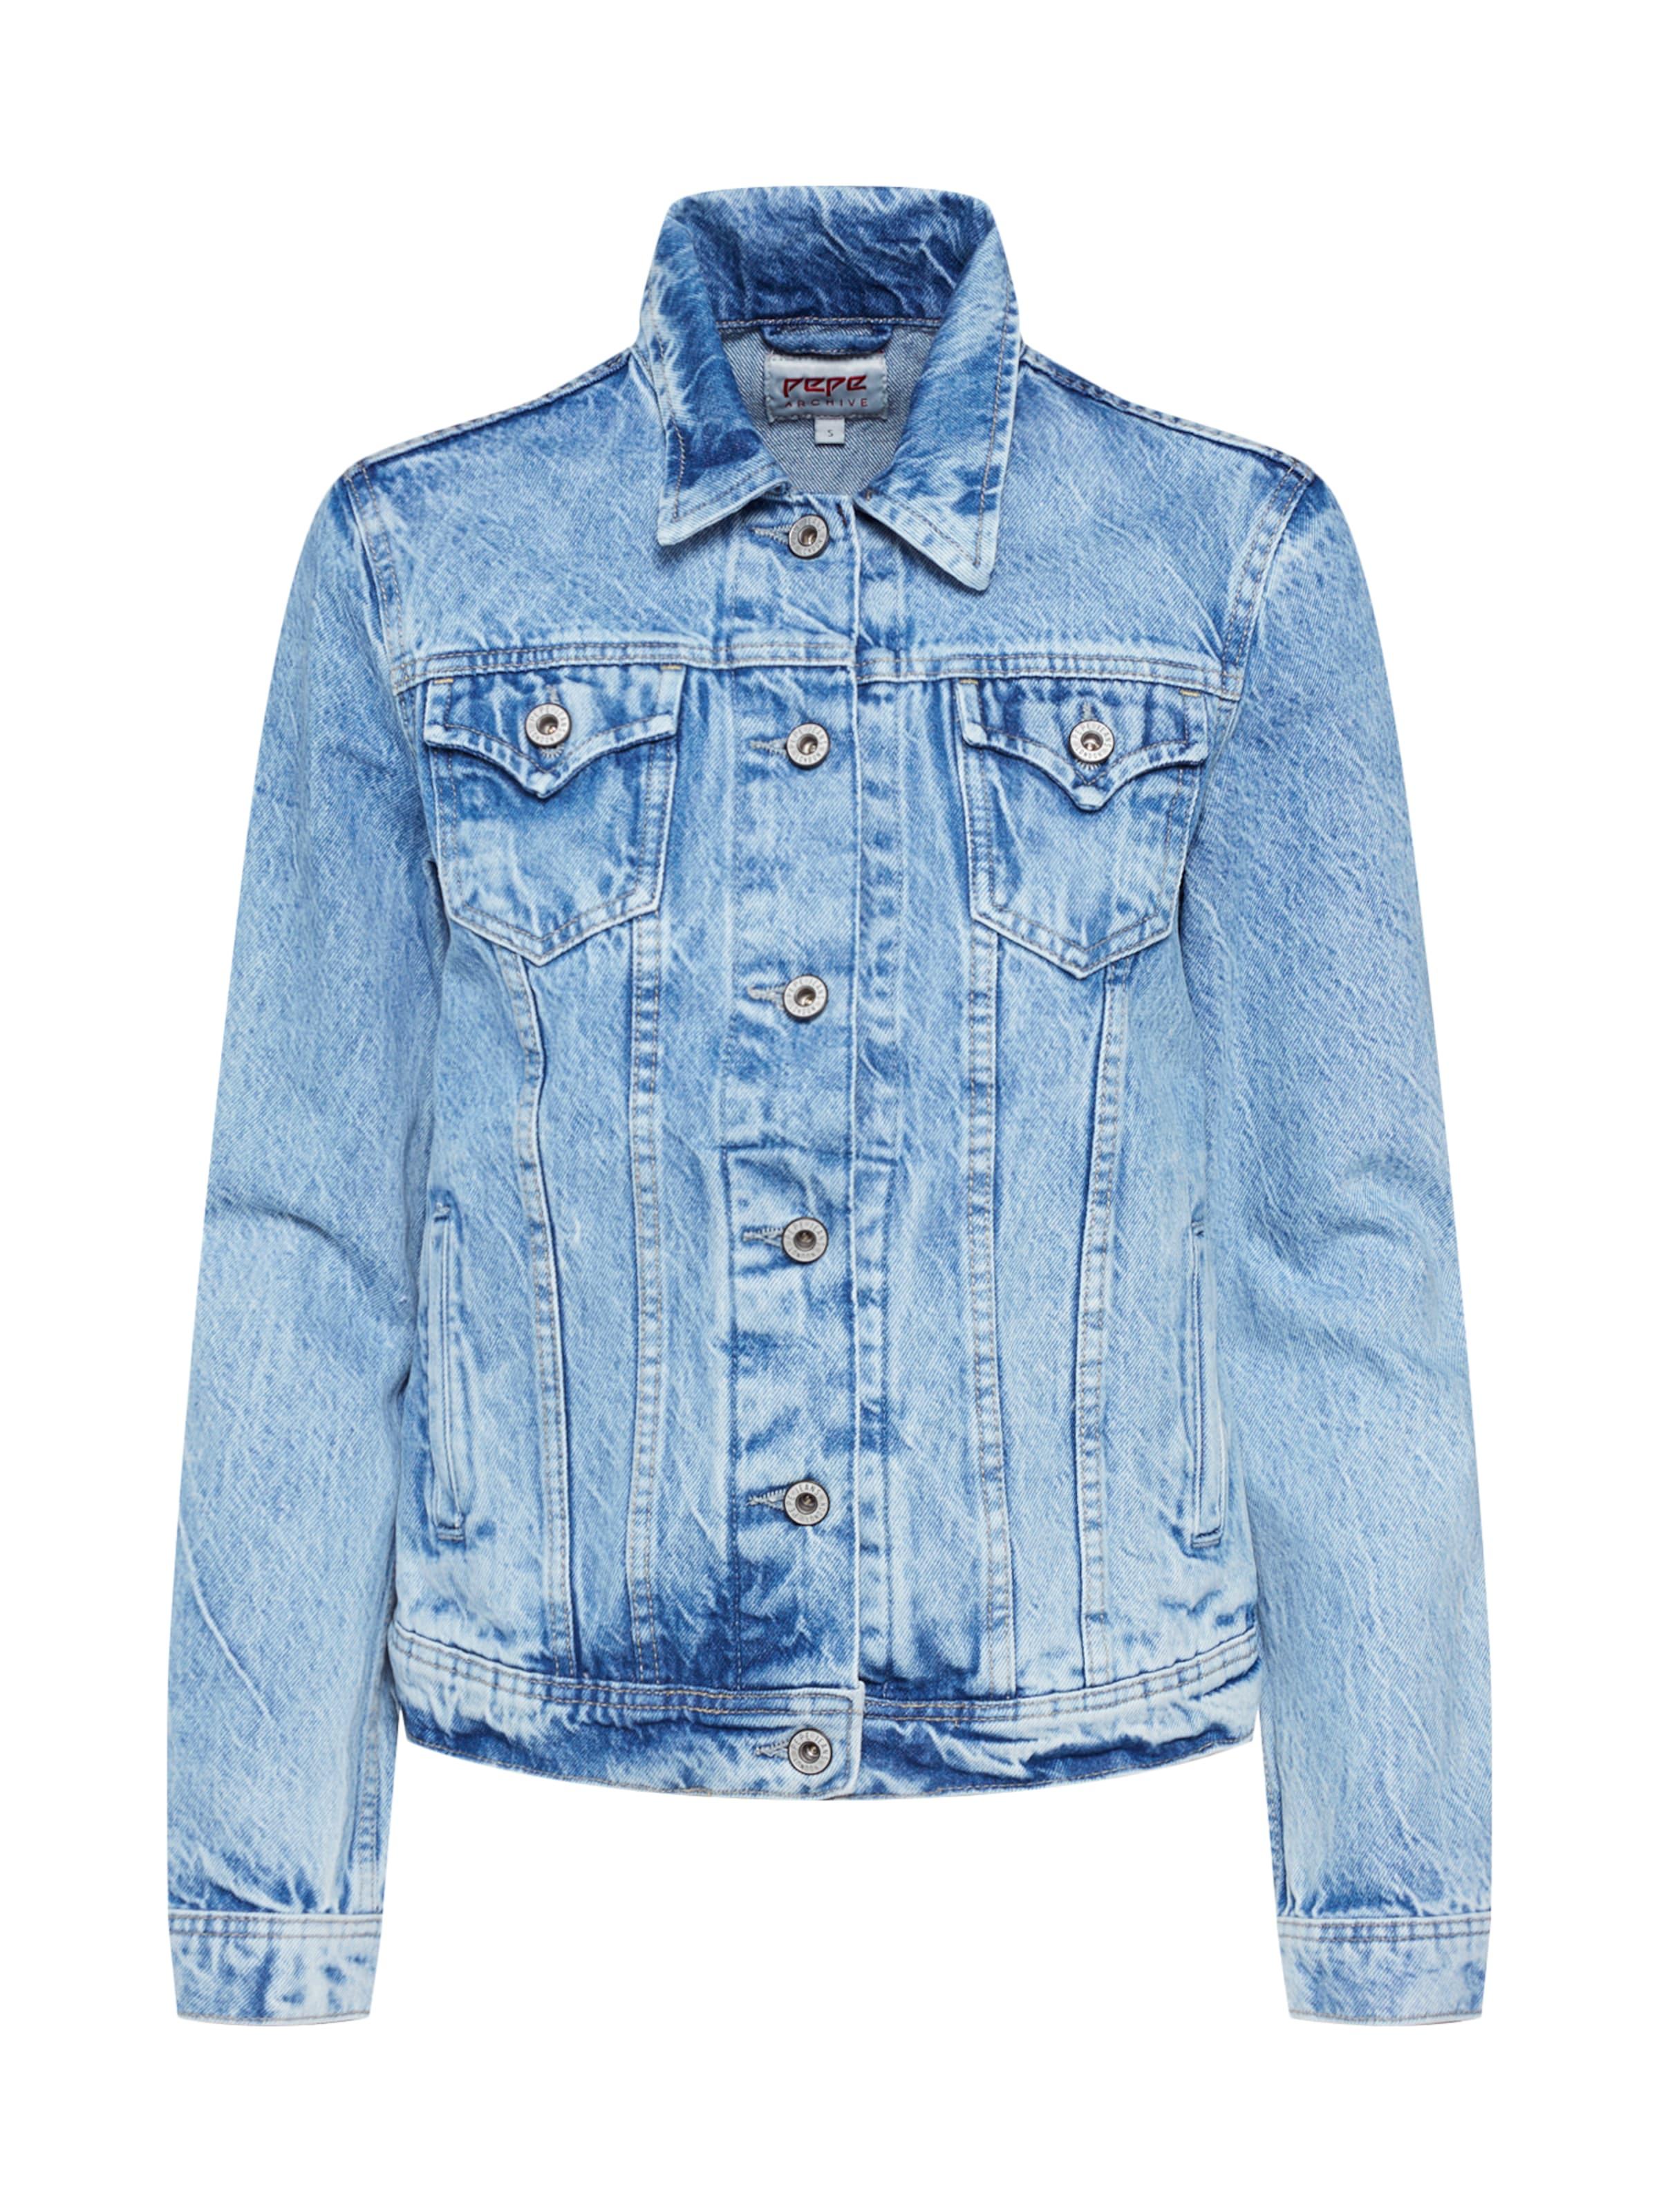 Denim saison Bleu Pepe 'thrift' In Mi JeansVeste fgy6Yb7